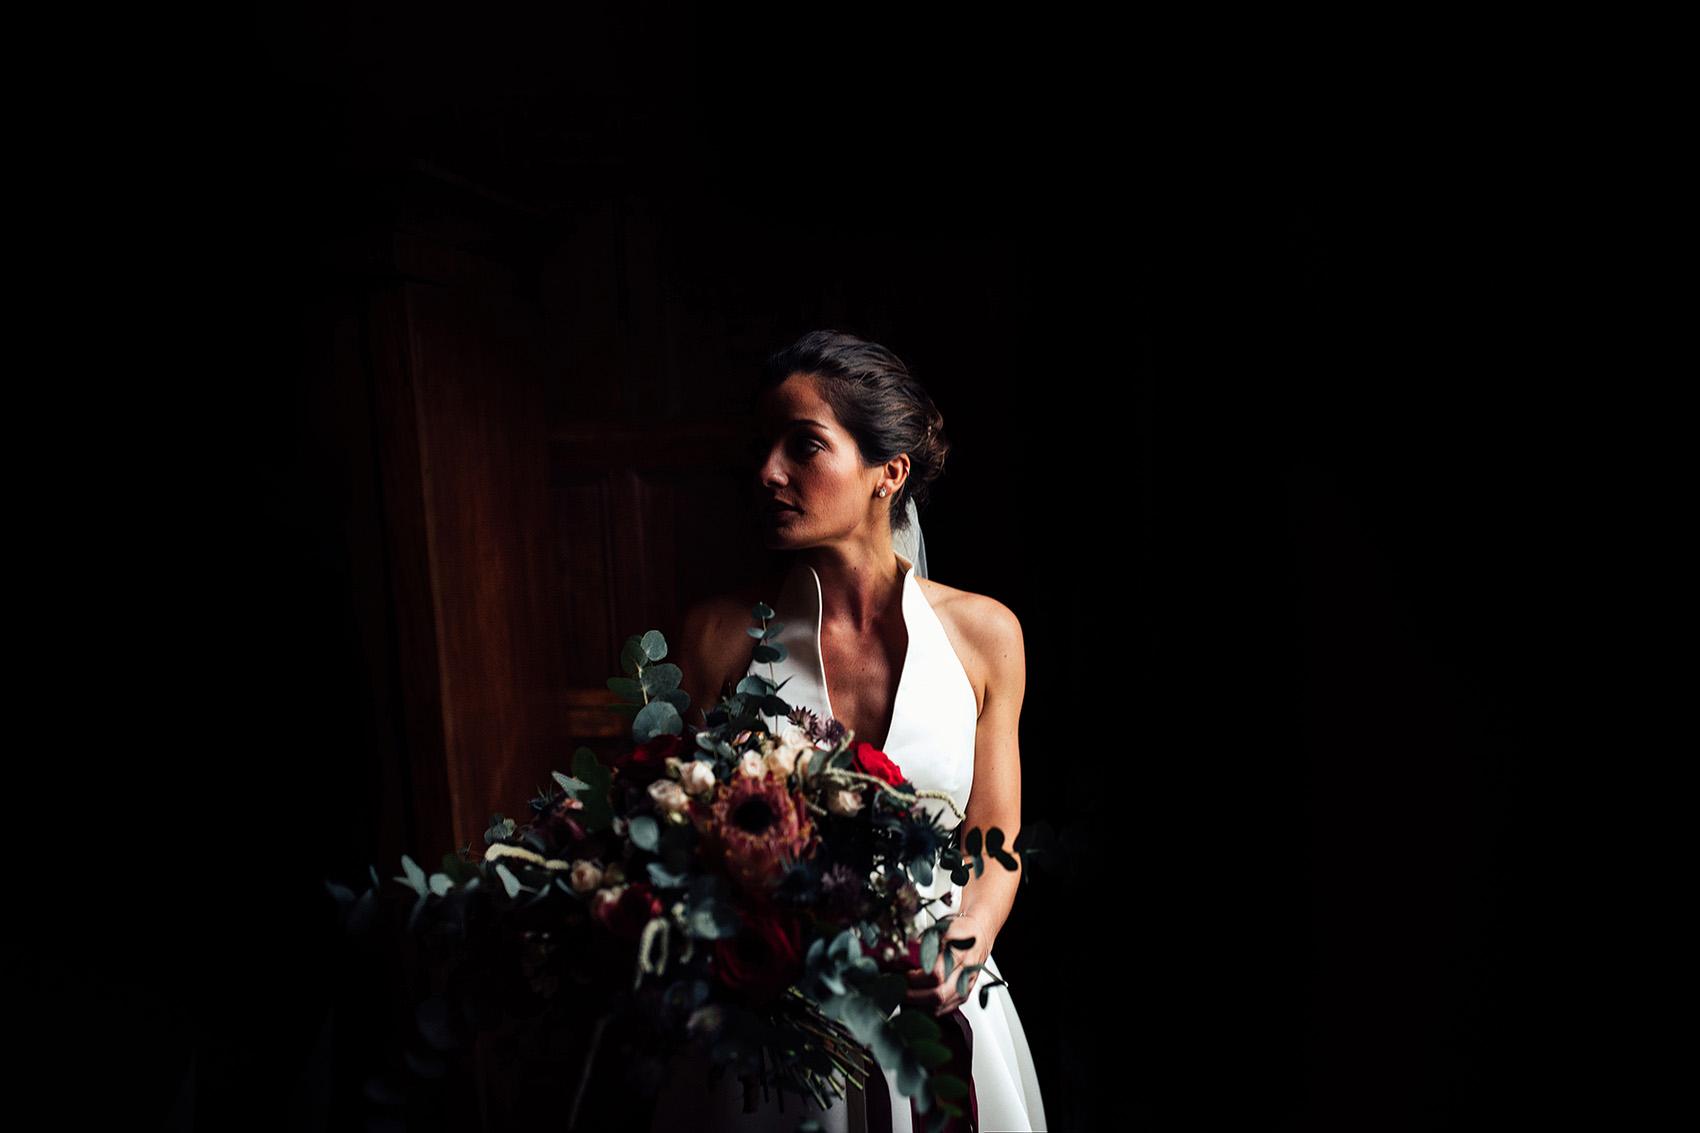 elmore-court-wedding-photography-25.jpg